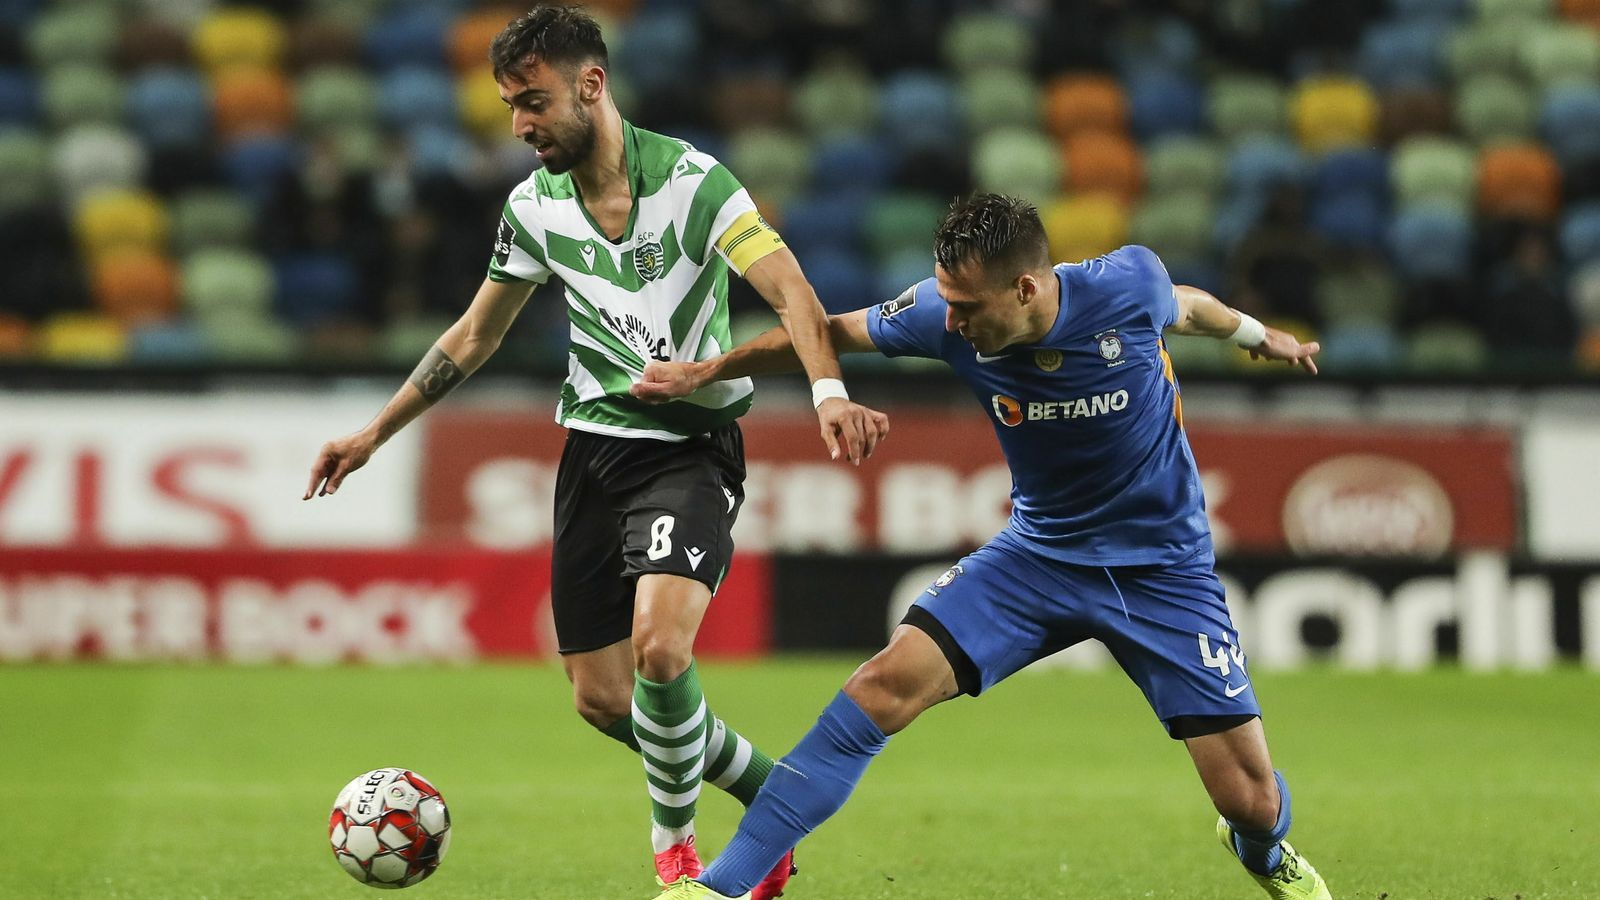 Bruno Fernandes, migcampista de l'Sporting de Portugal